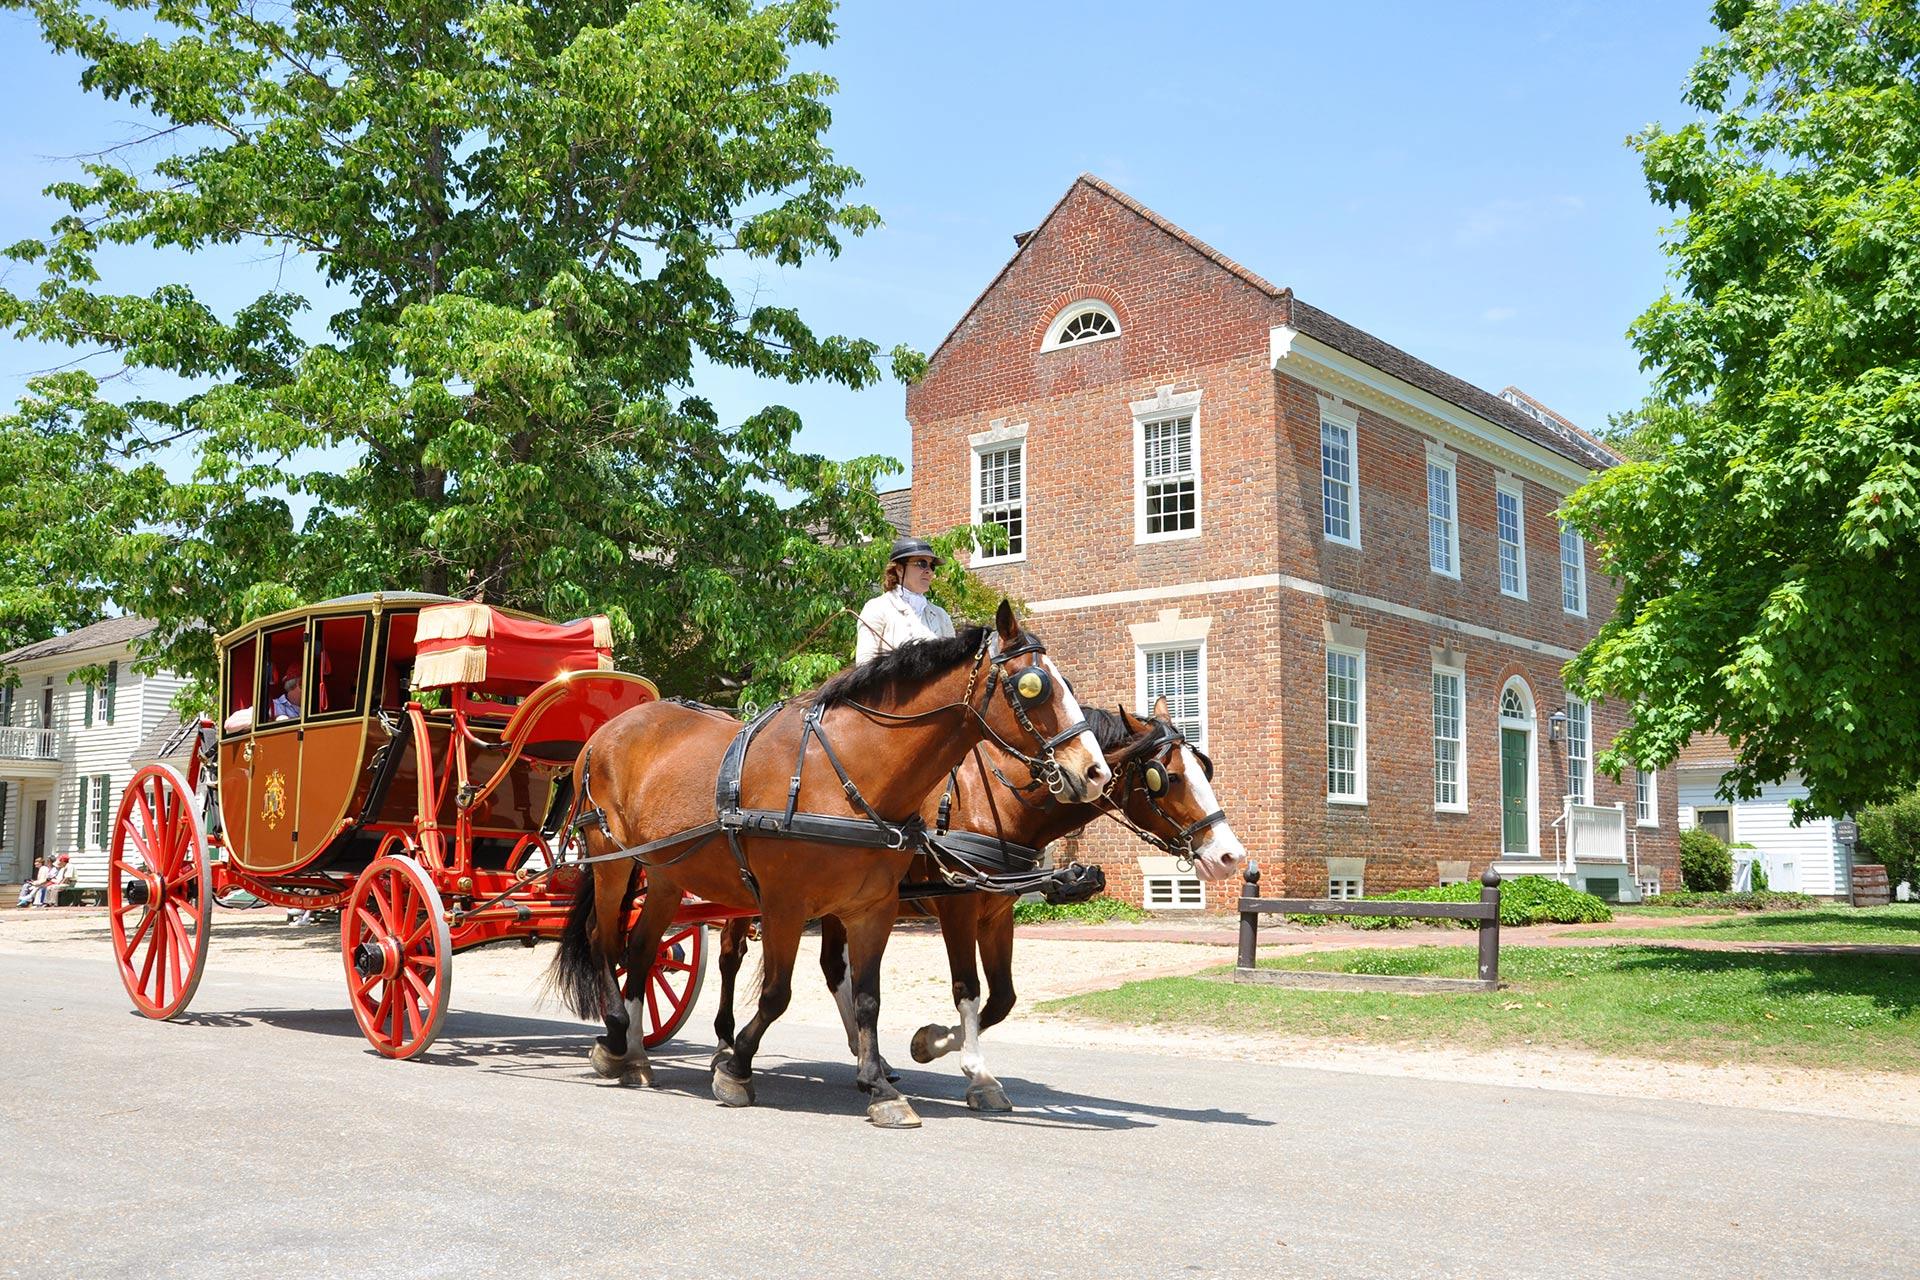 Colonial Williamsburg in Virginia; Photo Courtesy of jiawangkun/Shutterstock.com